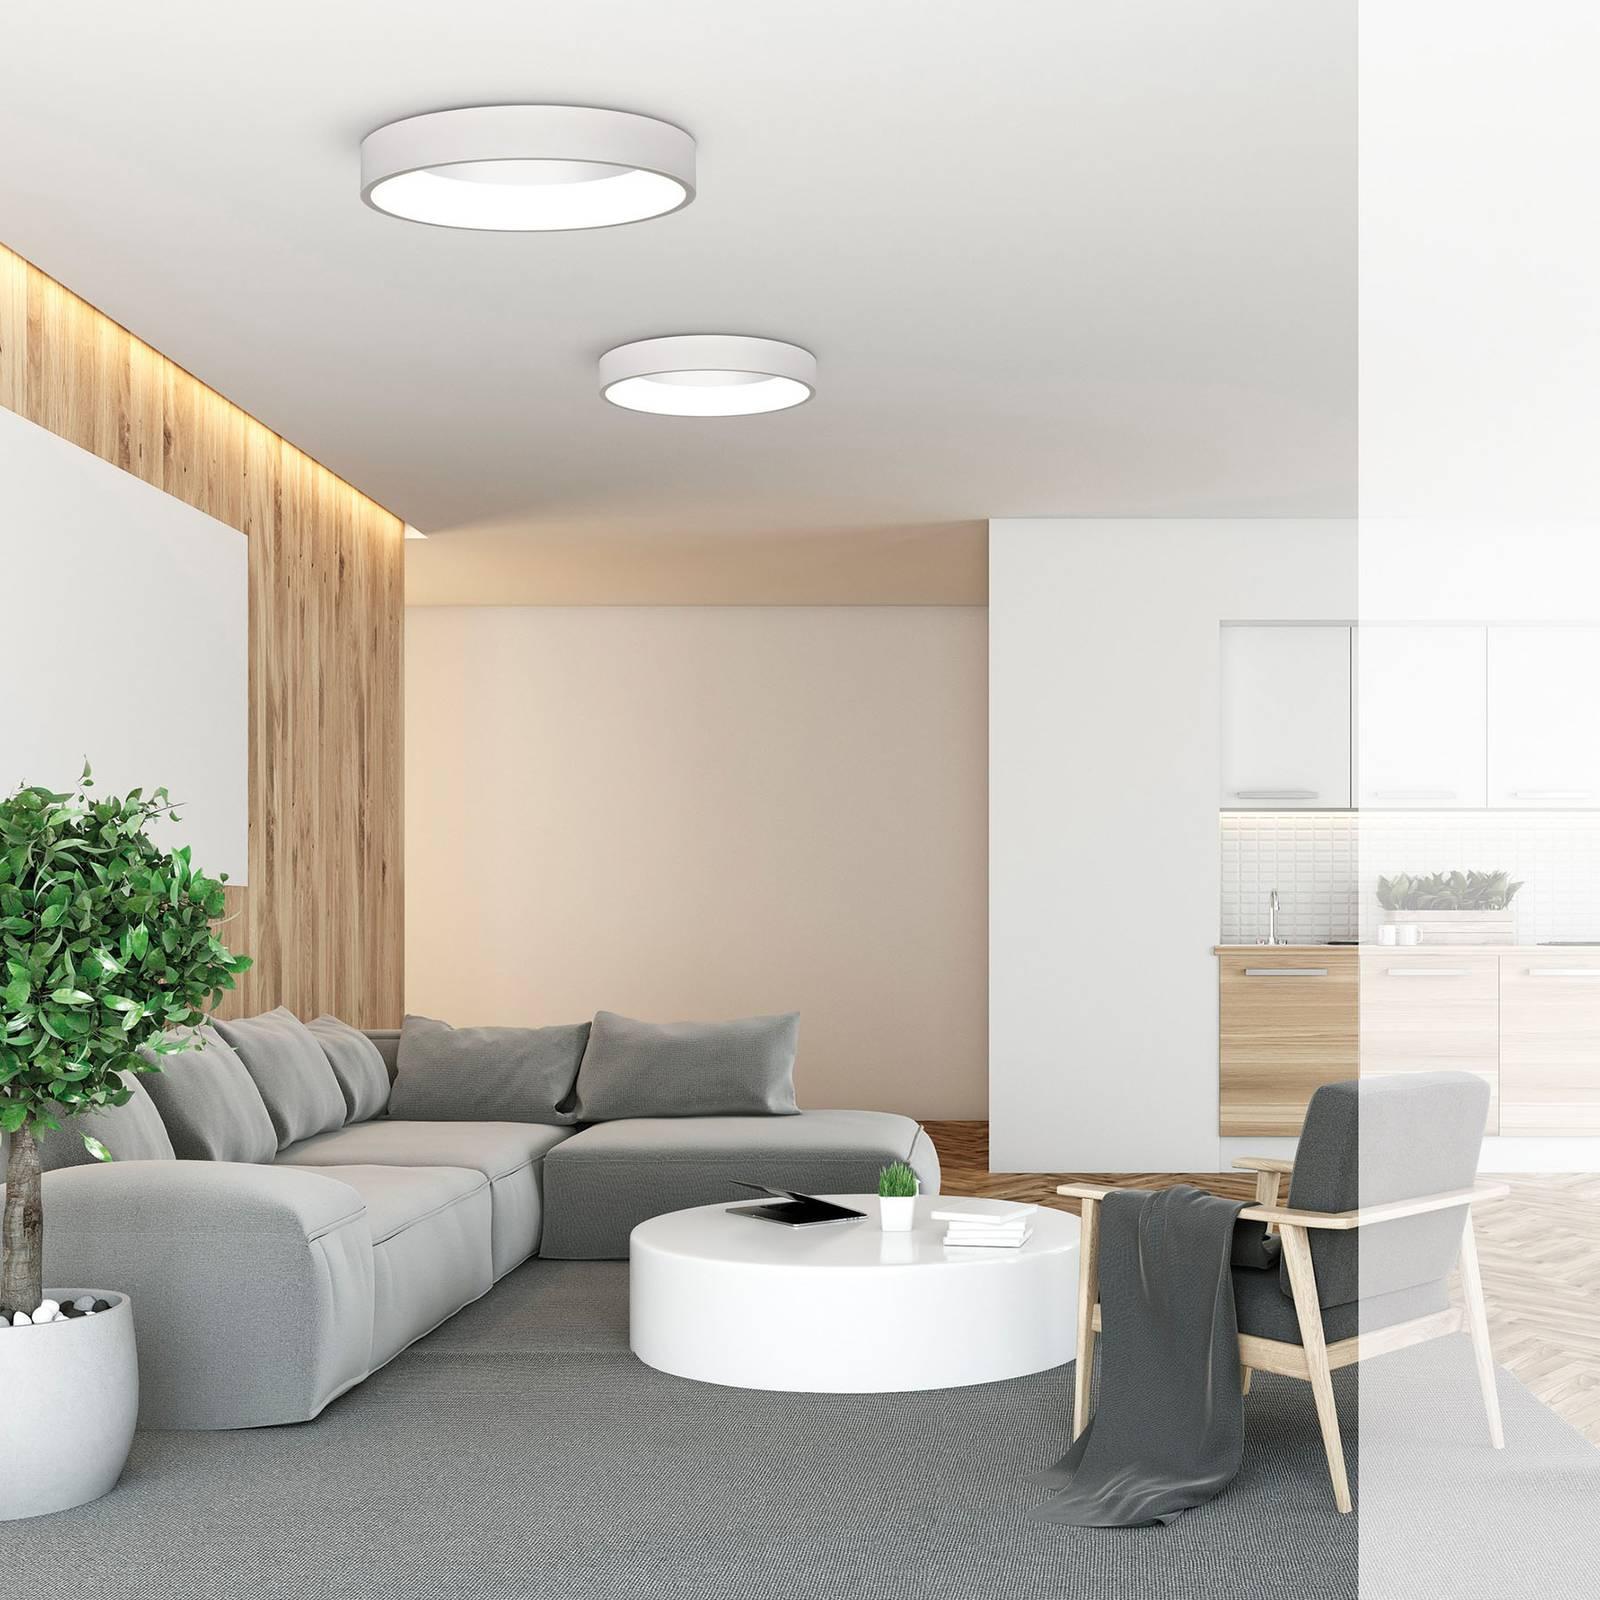 LED-kattovalaisin Dilga Ø 60 cm Casambi valkoinen